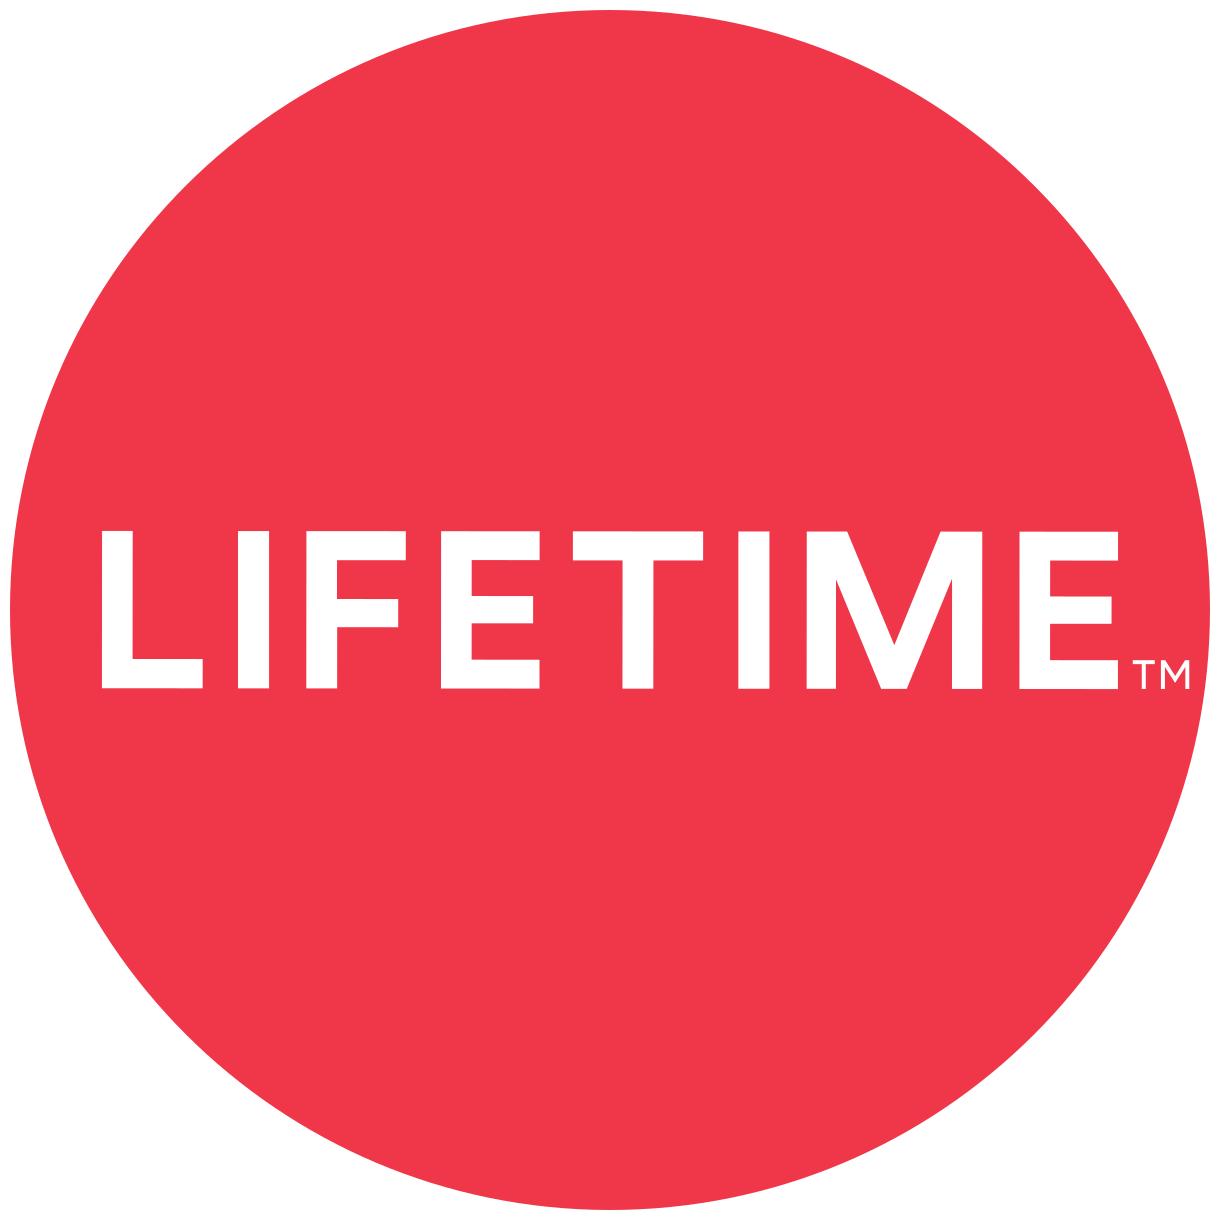 https://maddivaconcierge.com/wp-content/uploads/2017/05/lifetime_2017_logo_horizontal.png